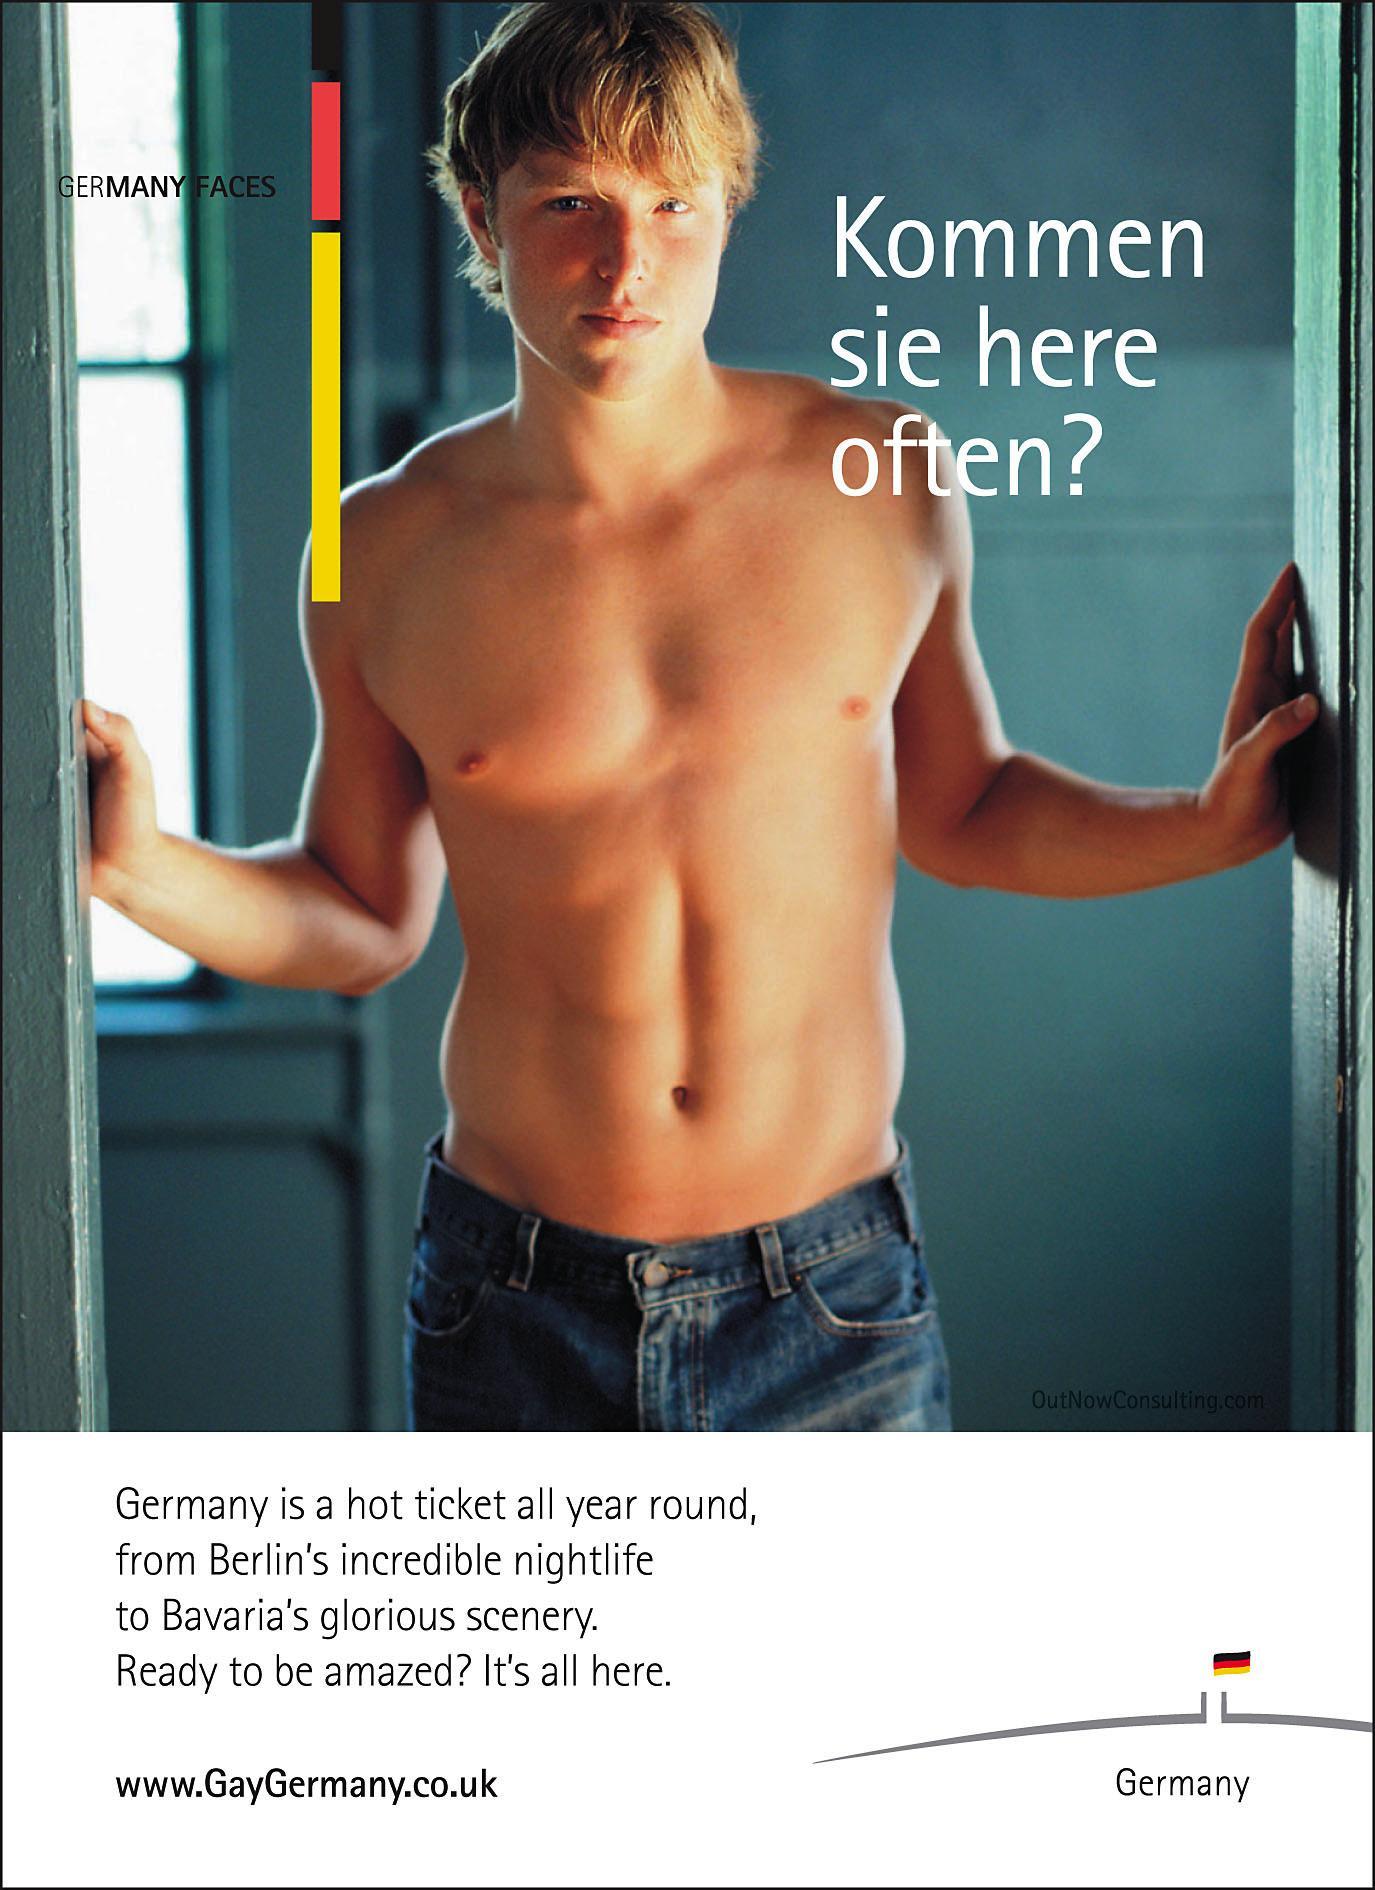 Gay Advertising -- Time Magazine Says Same Sex Sells